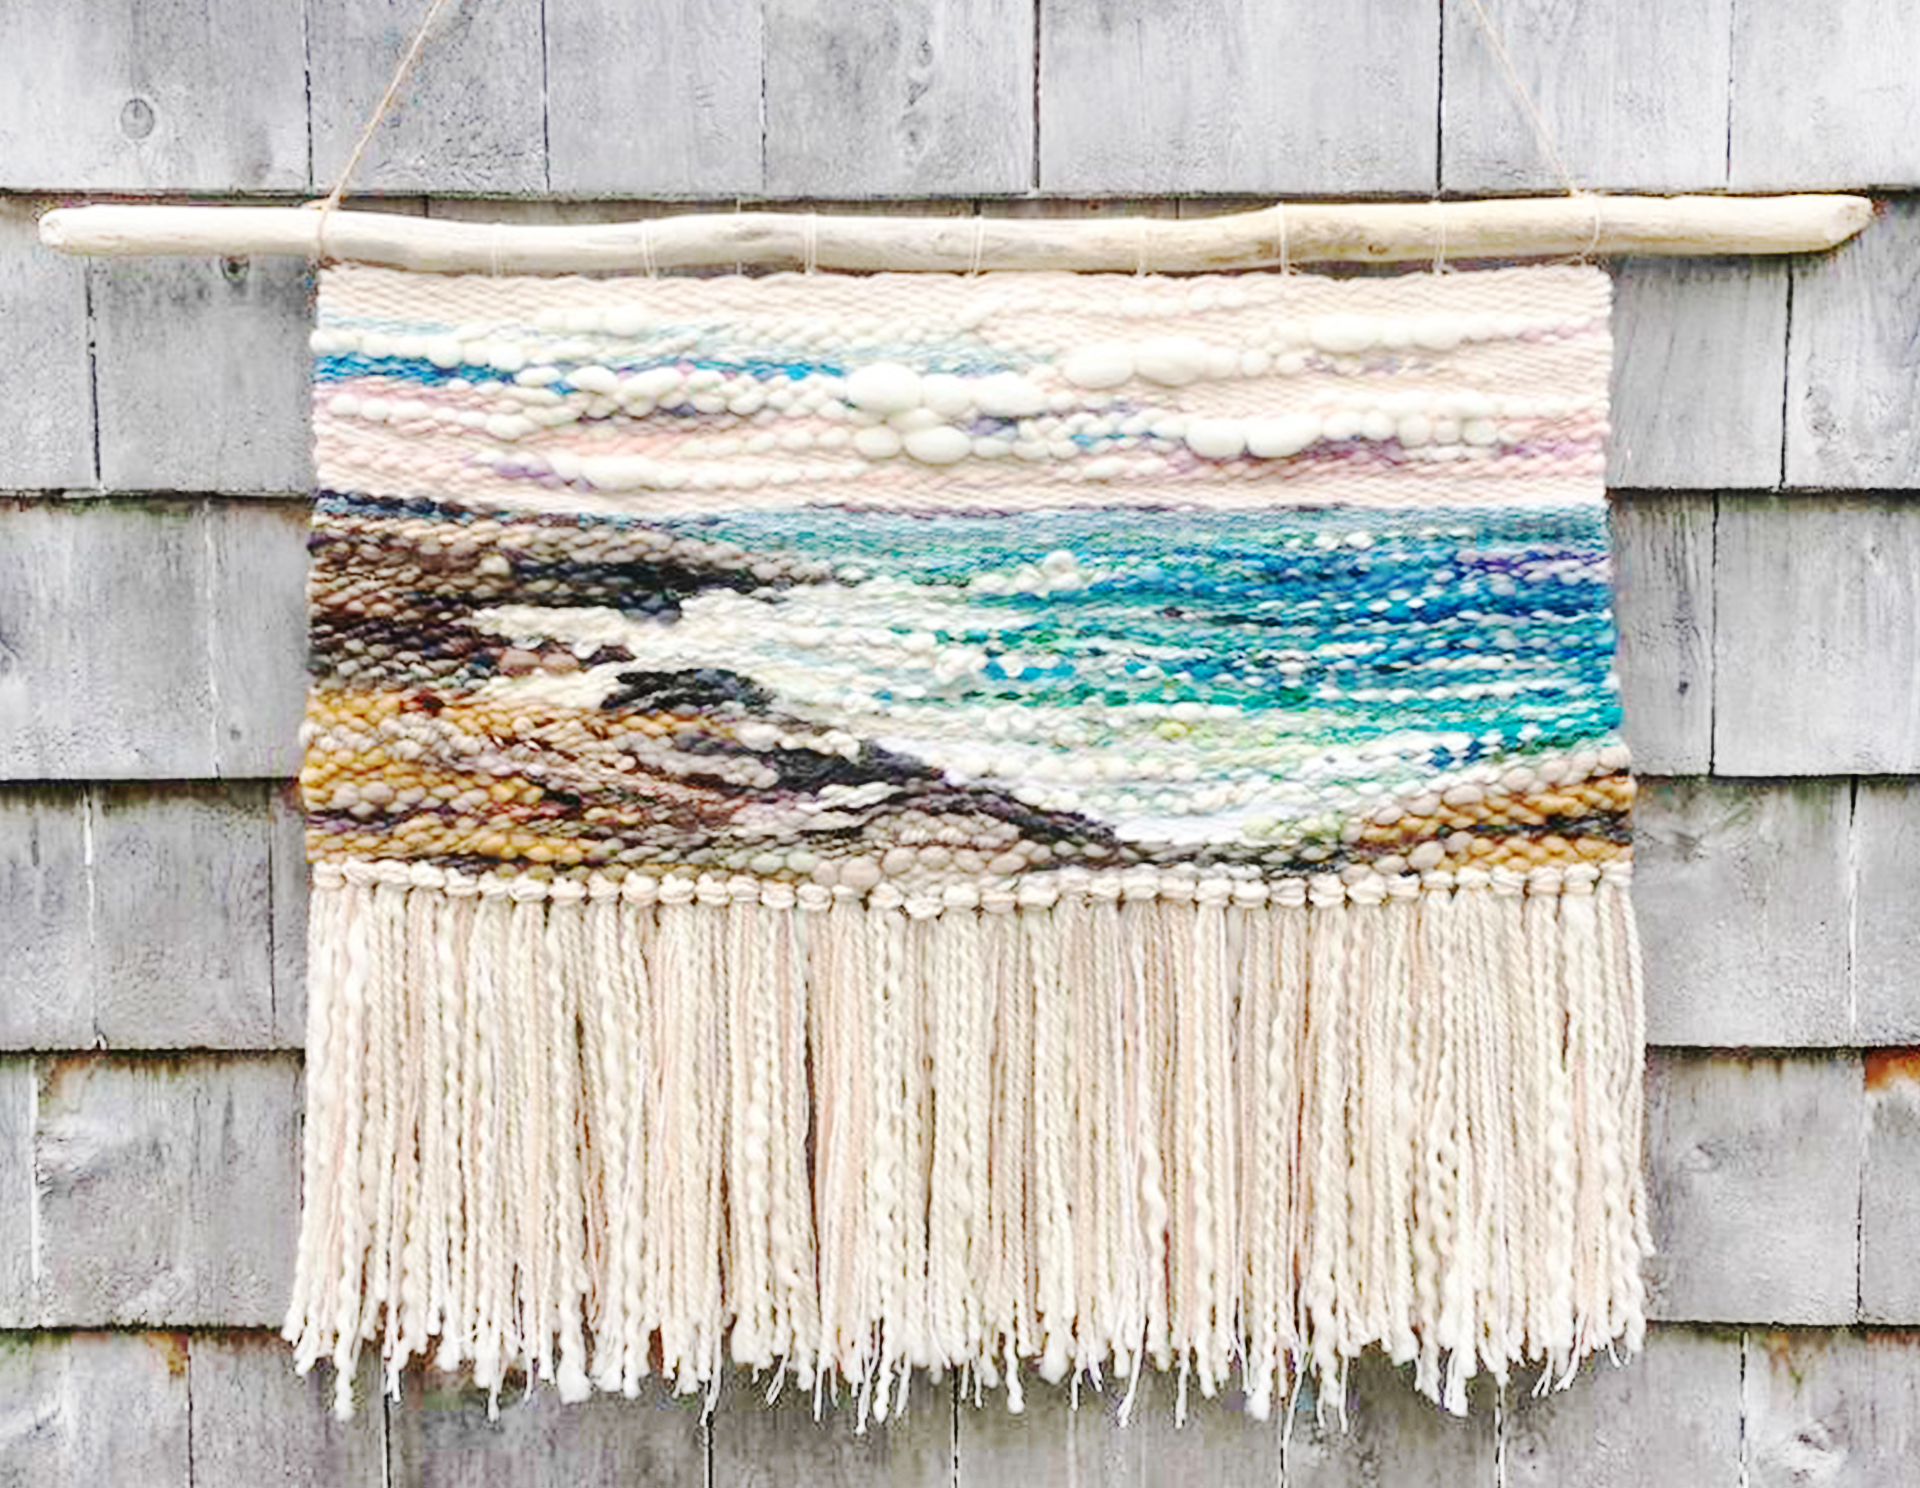 ocean of yarn 3.jpg